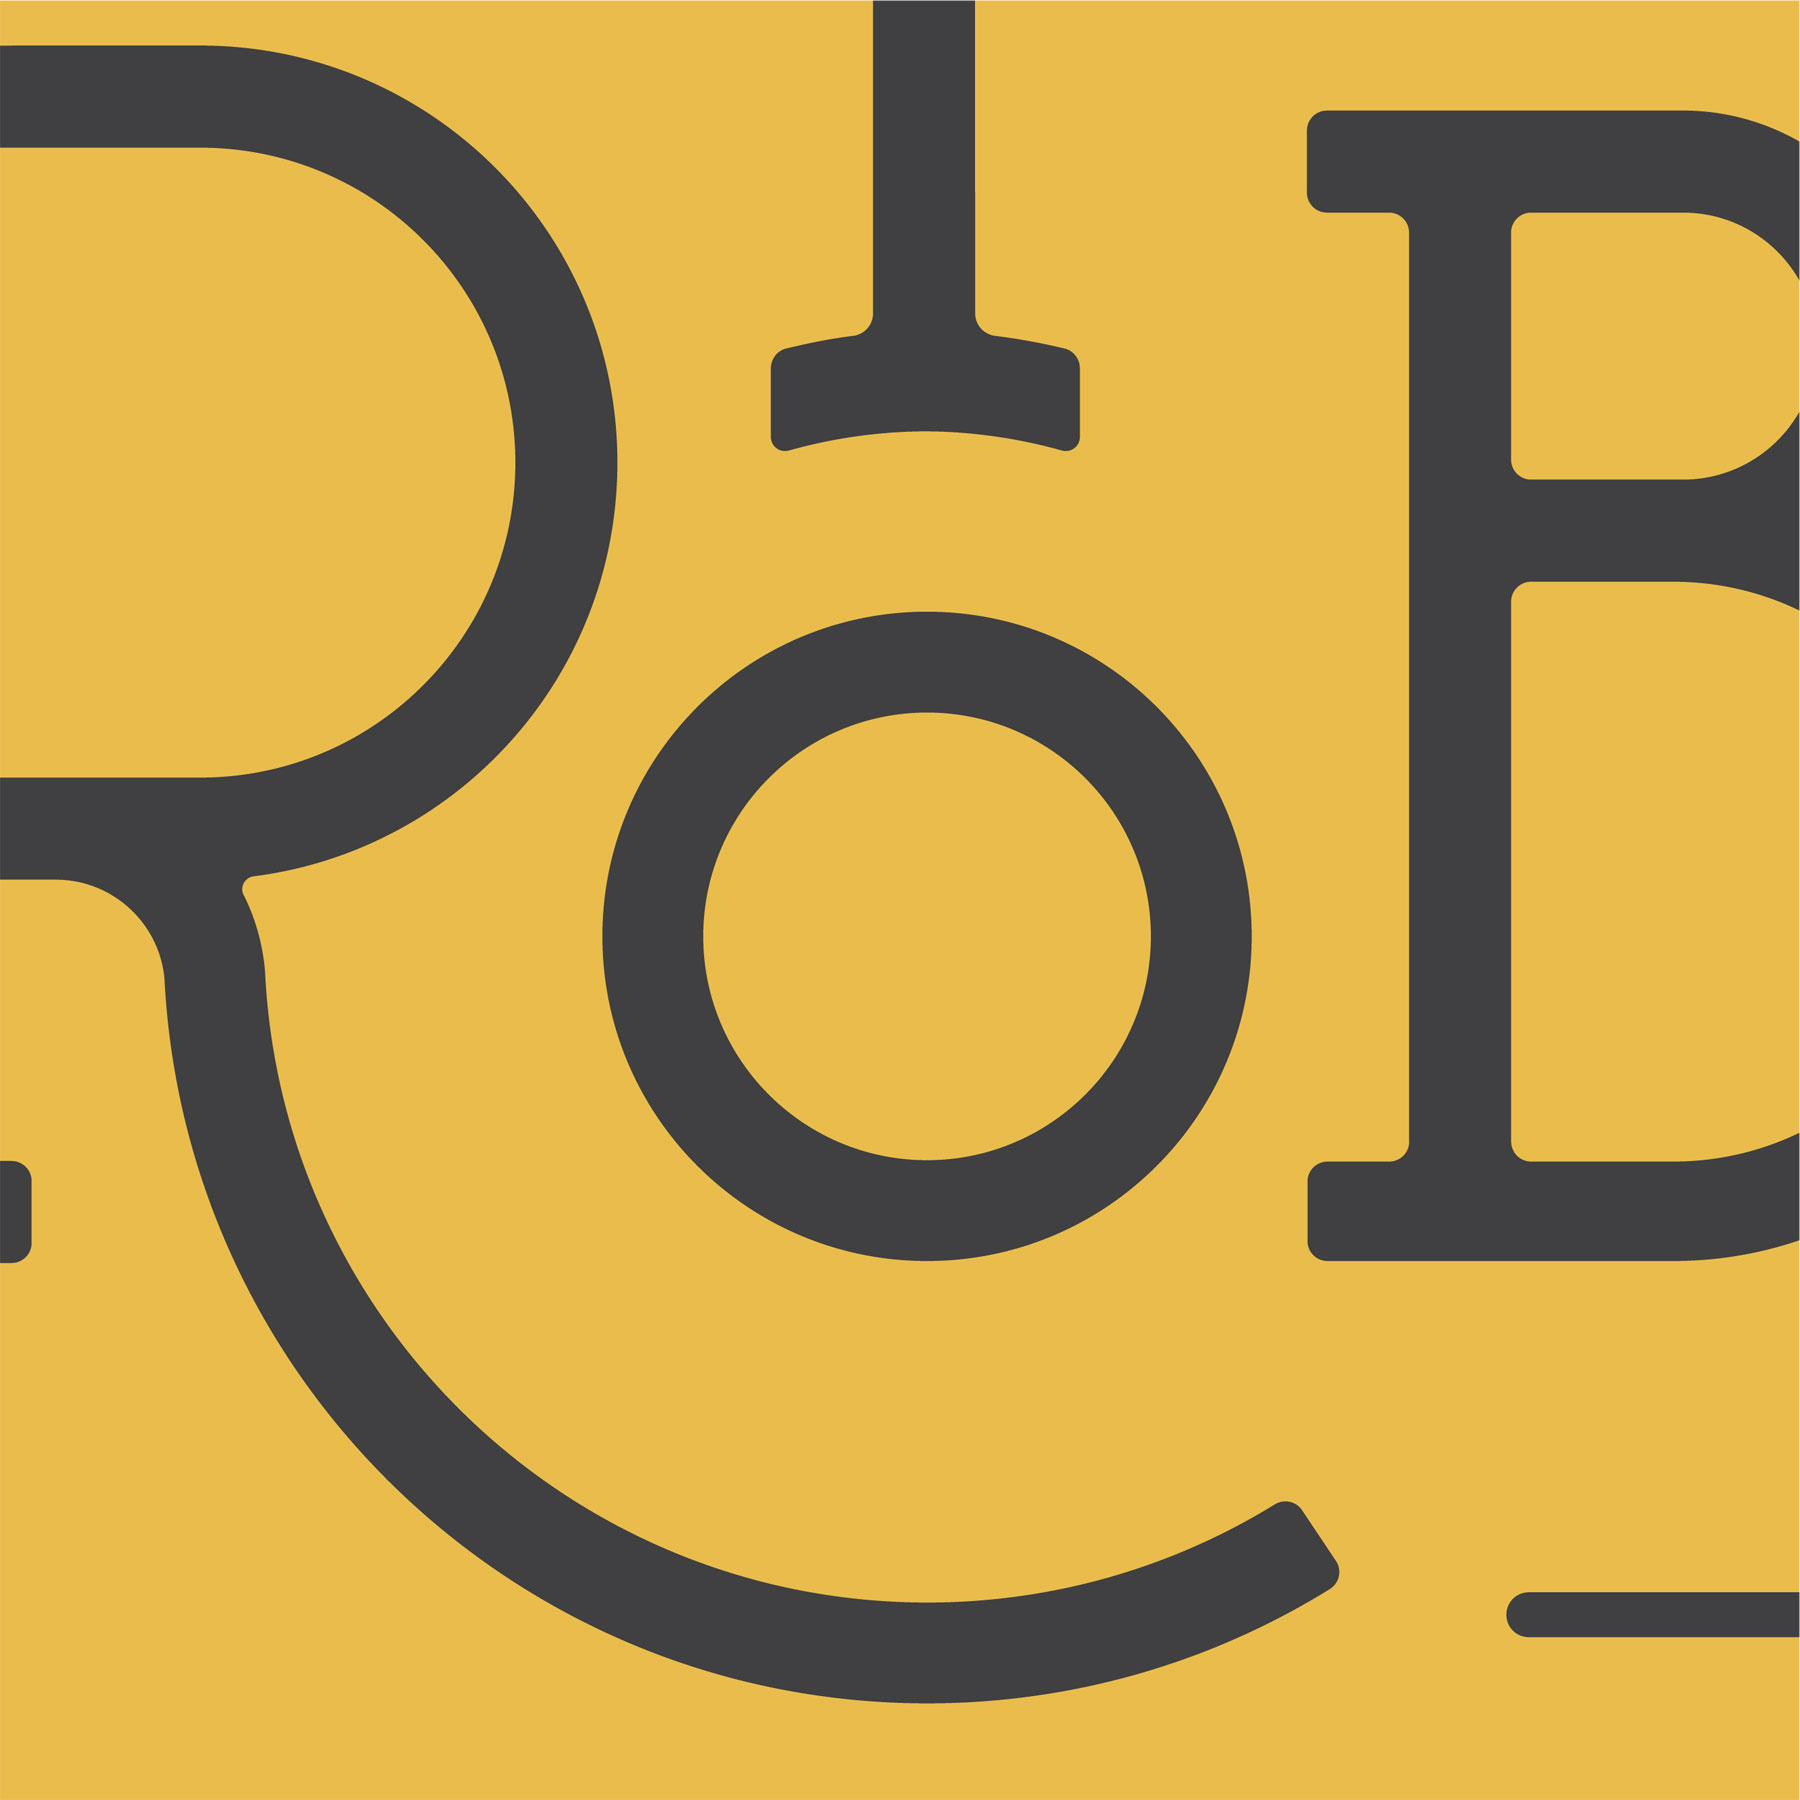 pip_robbins_logo_2.jpg